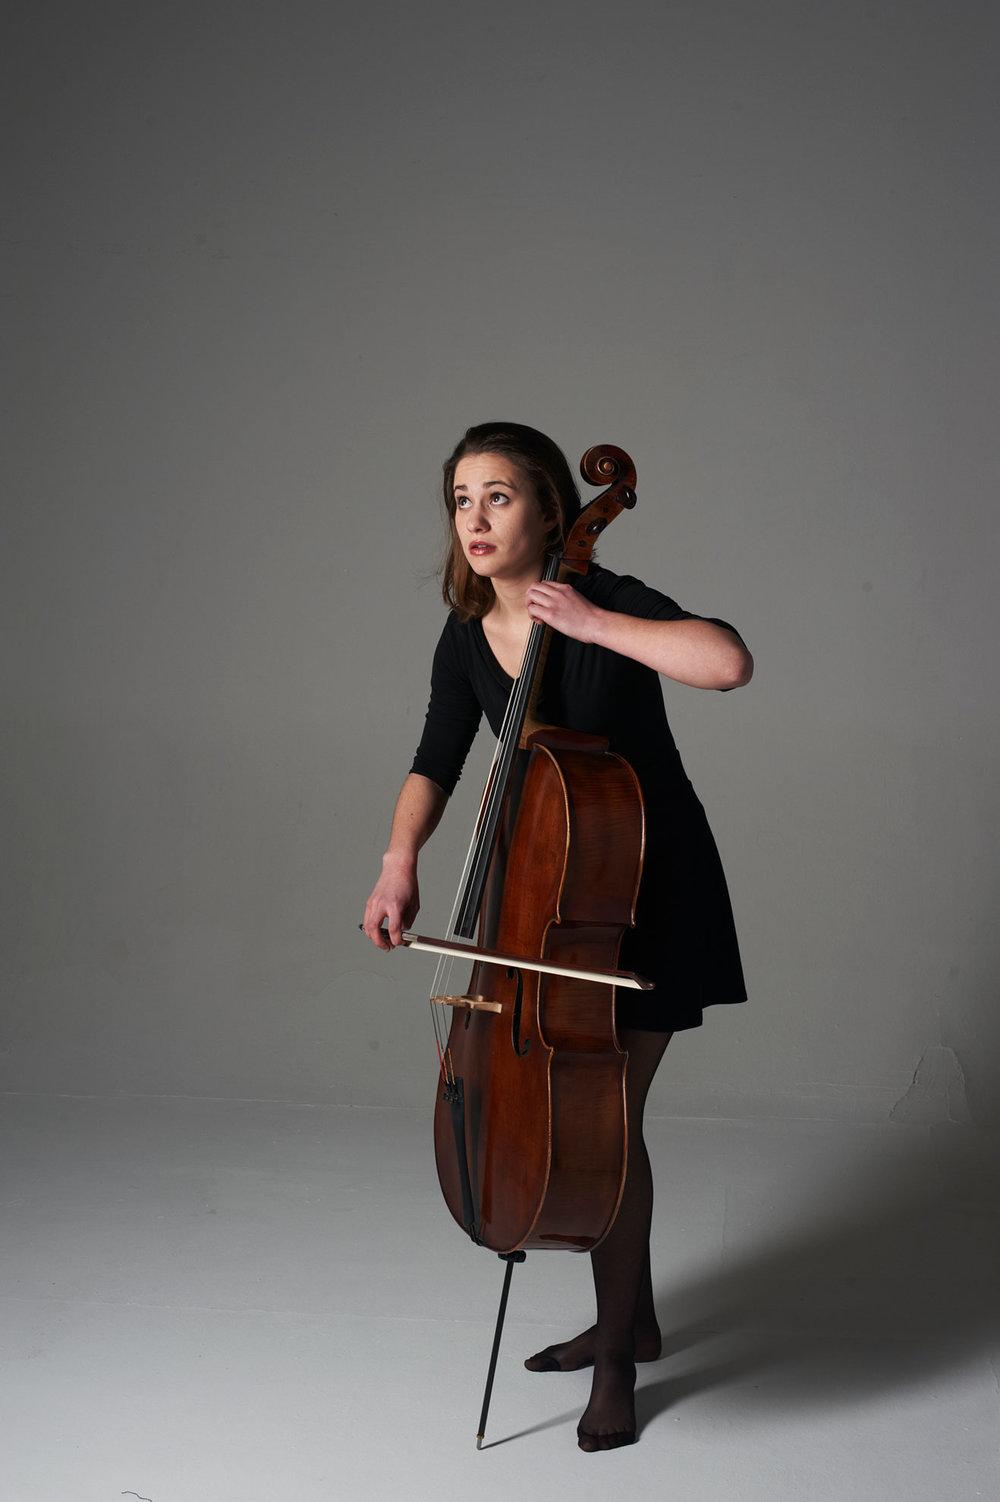 Latica Anic, Cellist